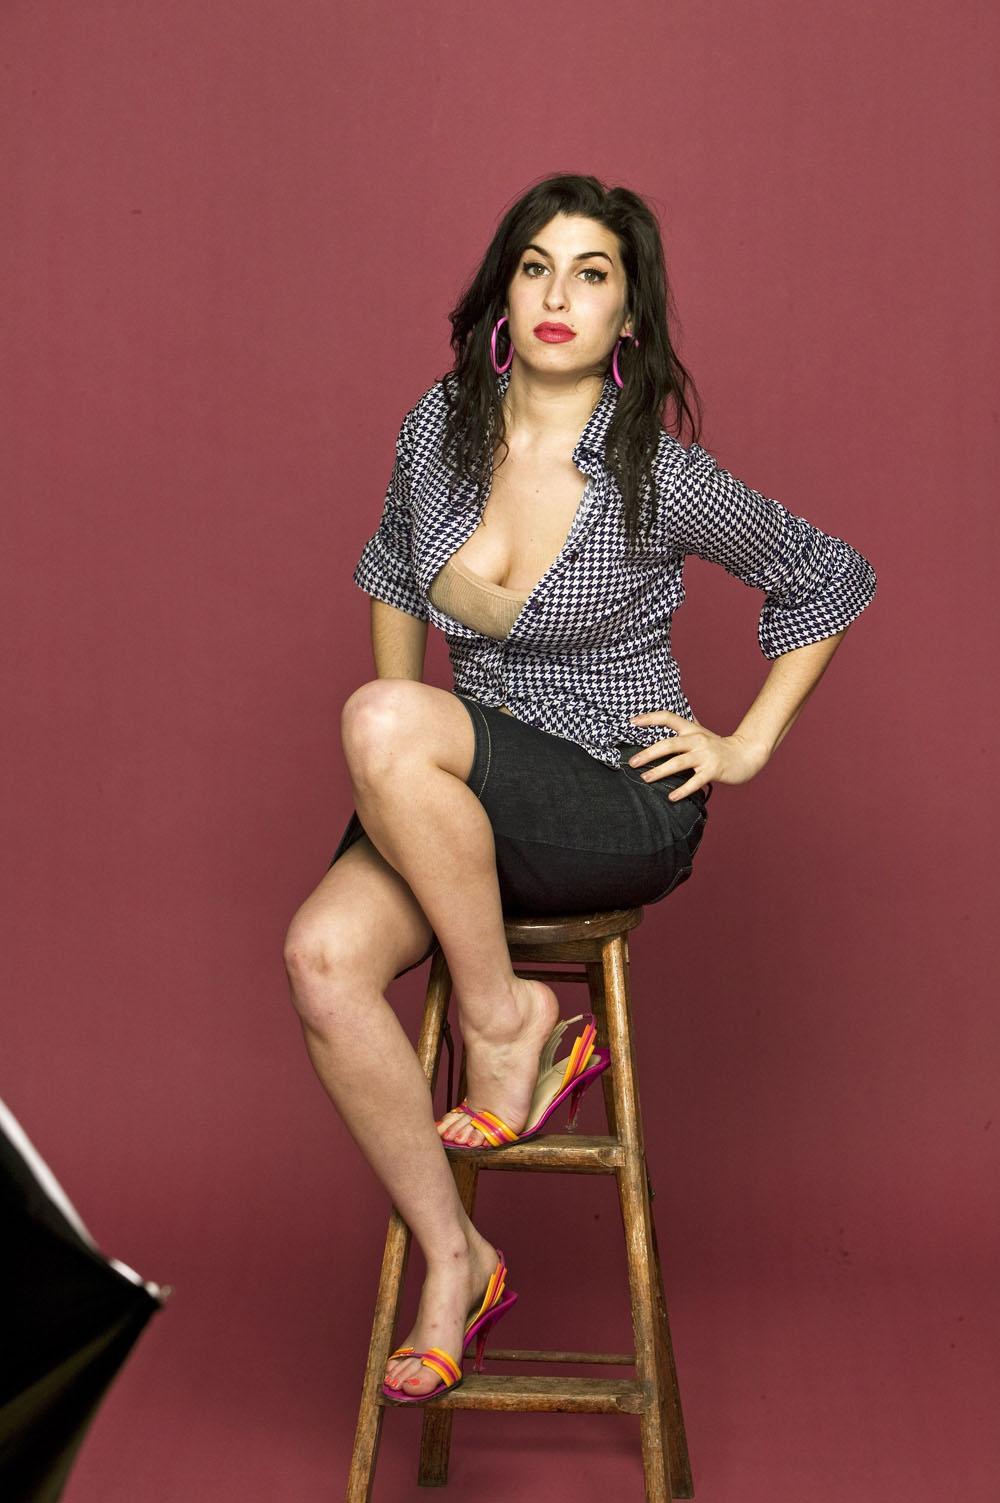 underwear Feet Amy Winehouse naked photo 2017